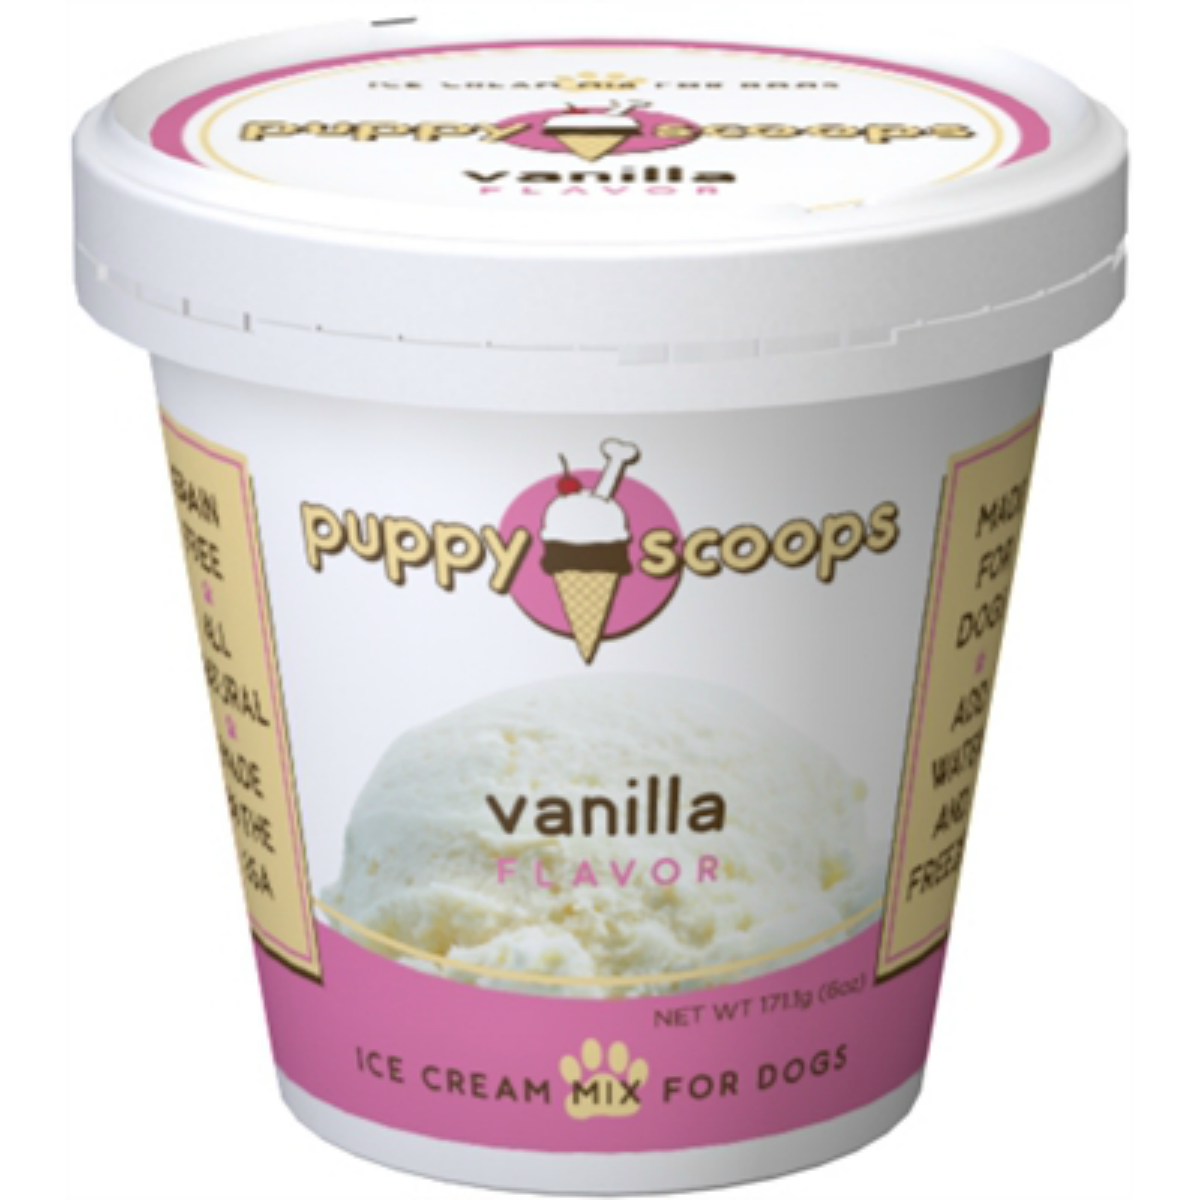 Puppy Scoops Ice Cream Mix - Vanilla